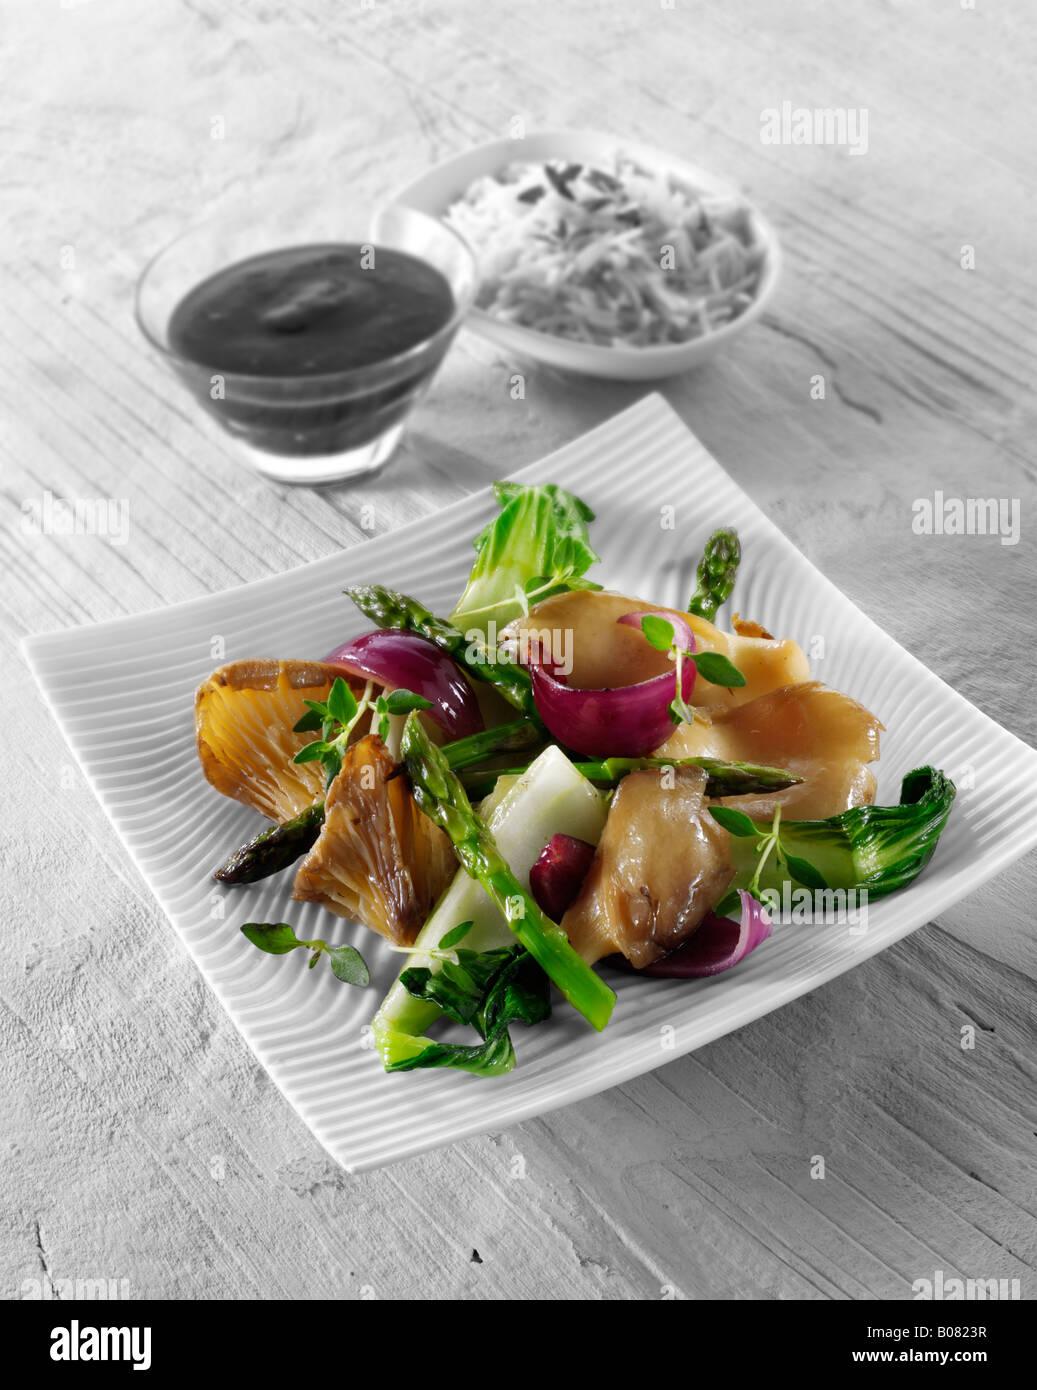 Oriental vegetarian stir fry of vegetables with pak choi, asparagus, mnushrooms and hoisin sauce - Stock Image